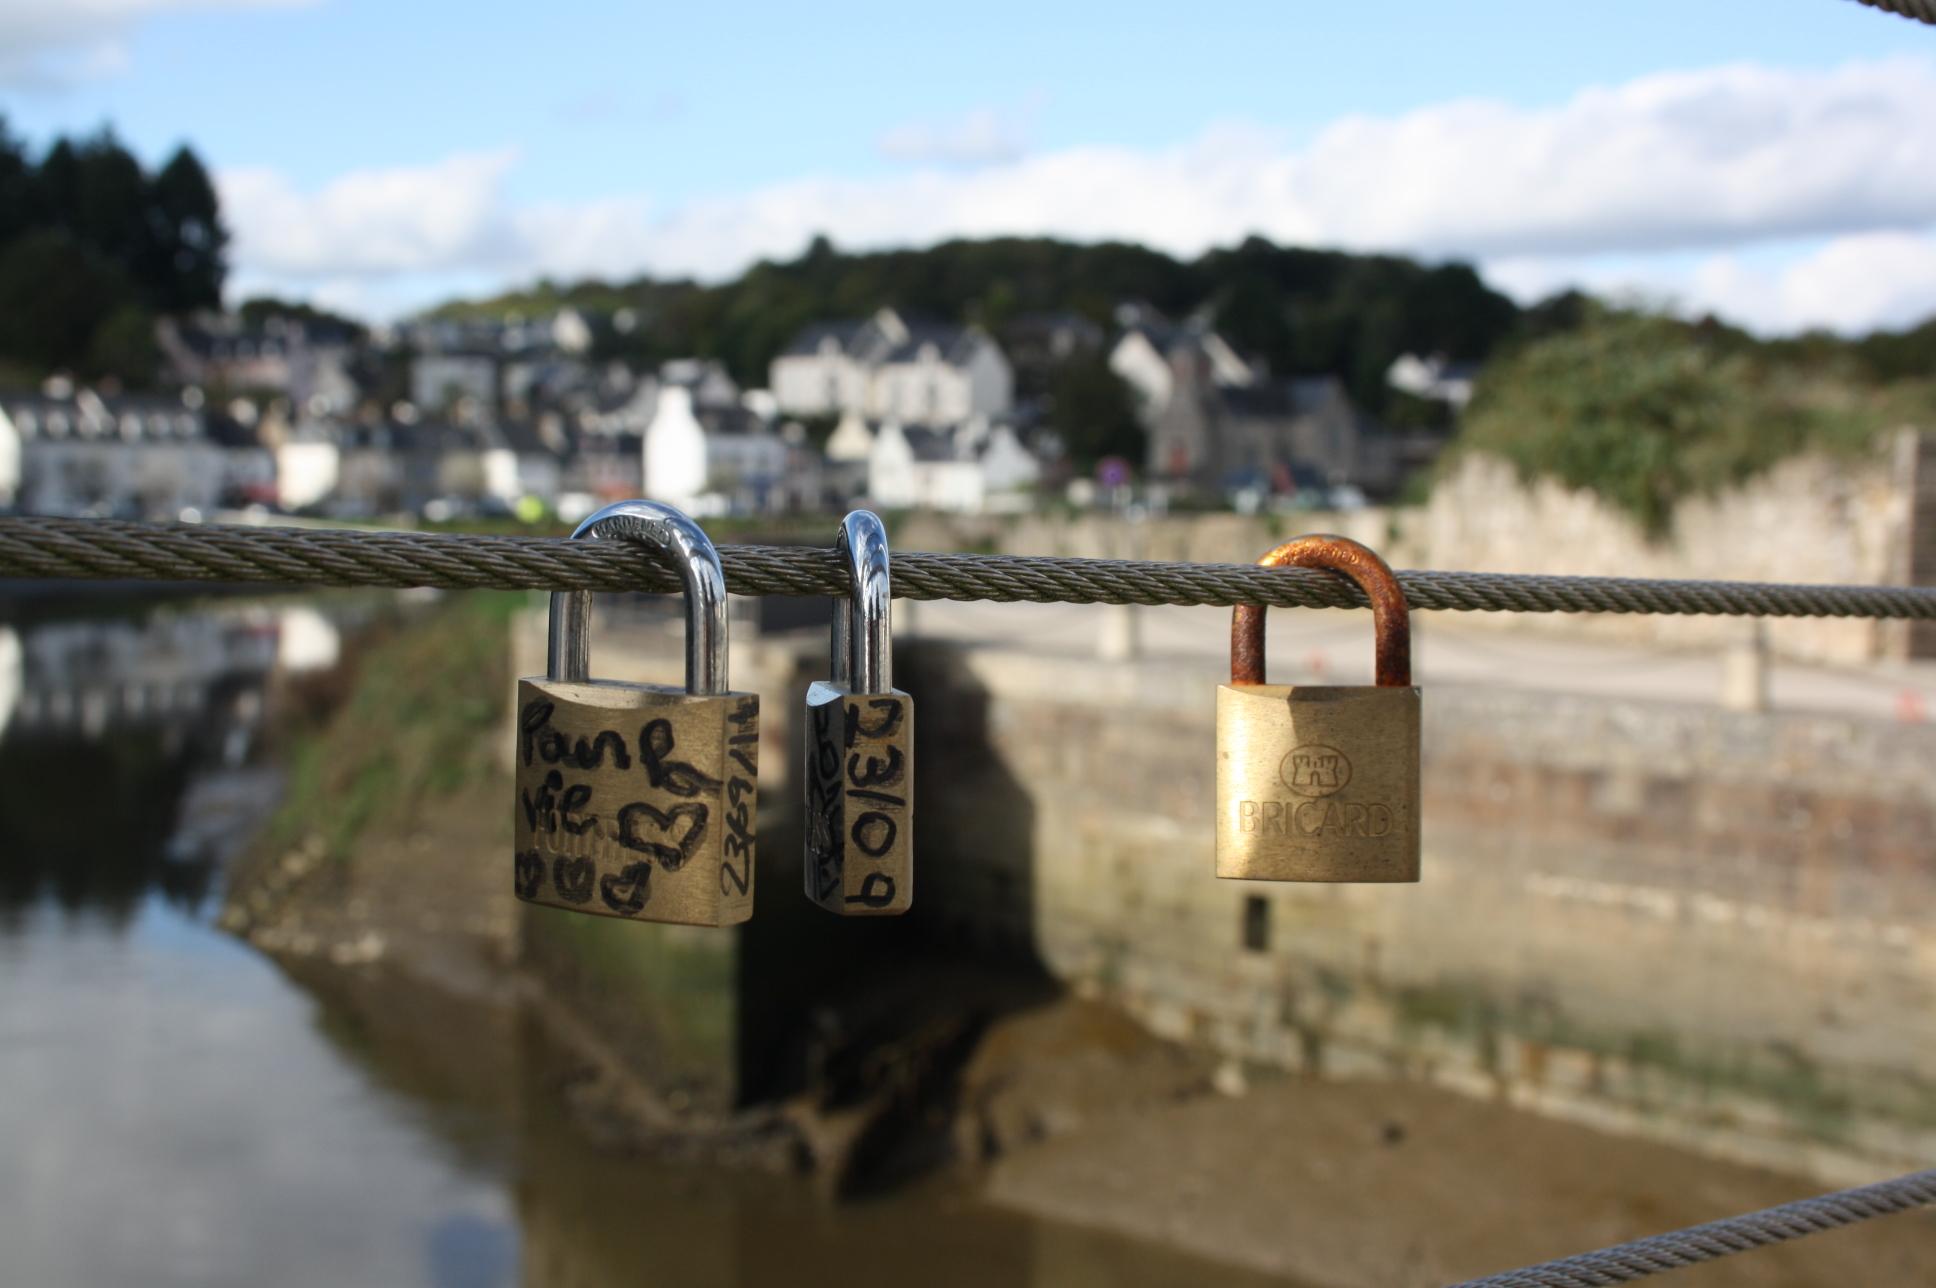 pont cadenas d'amour hennebont bretagne